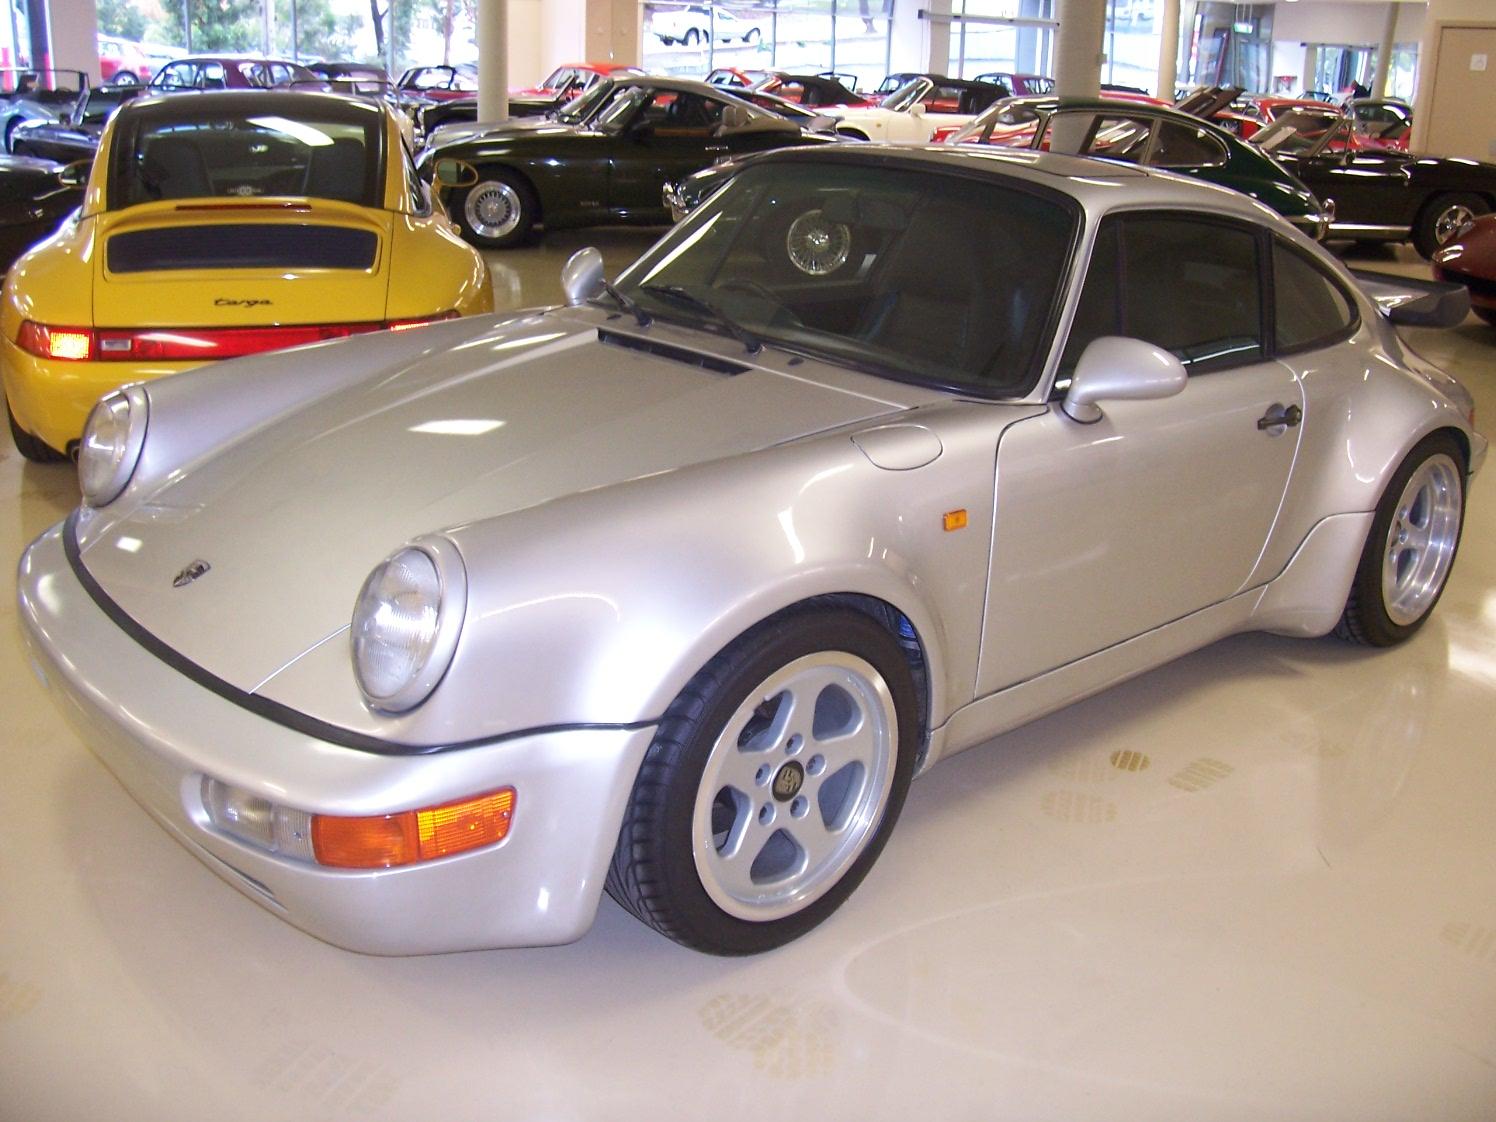 For Sale 1980 Porsche 930 911 Turbo Performancedrive